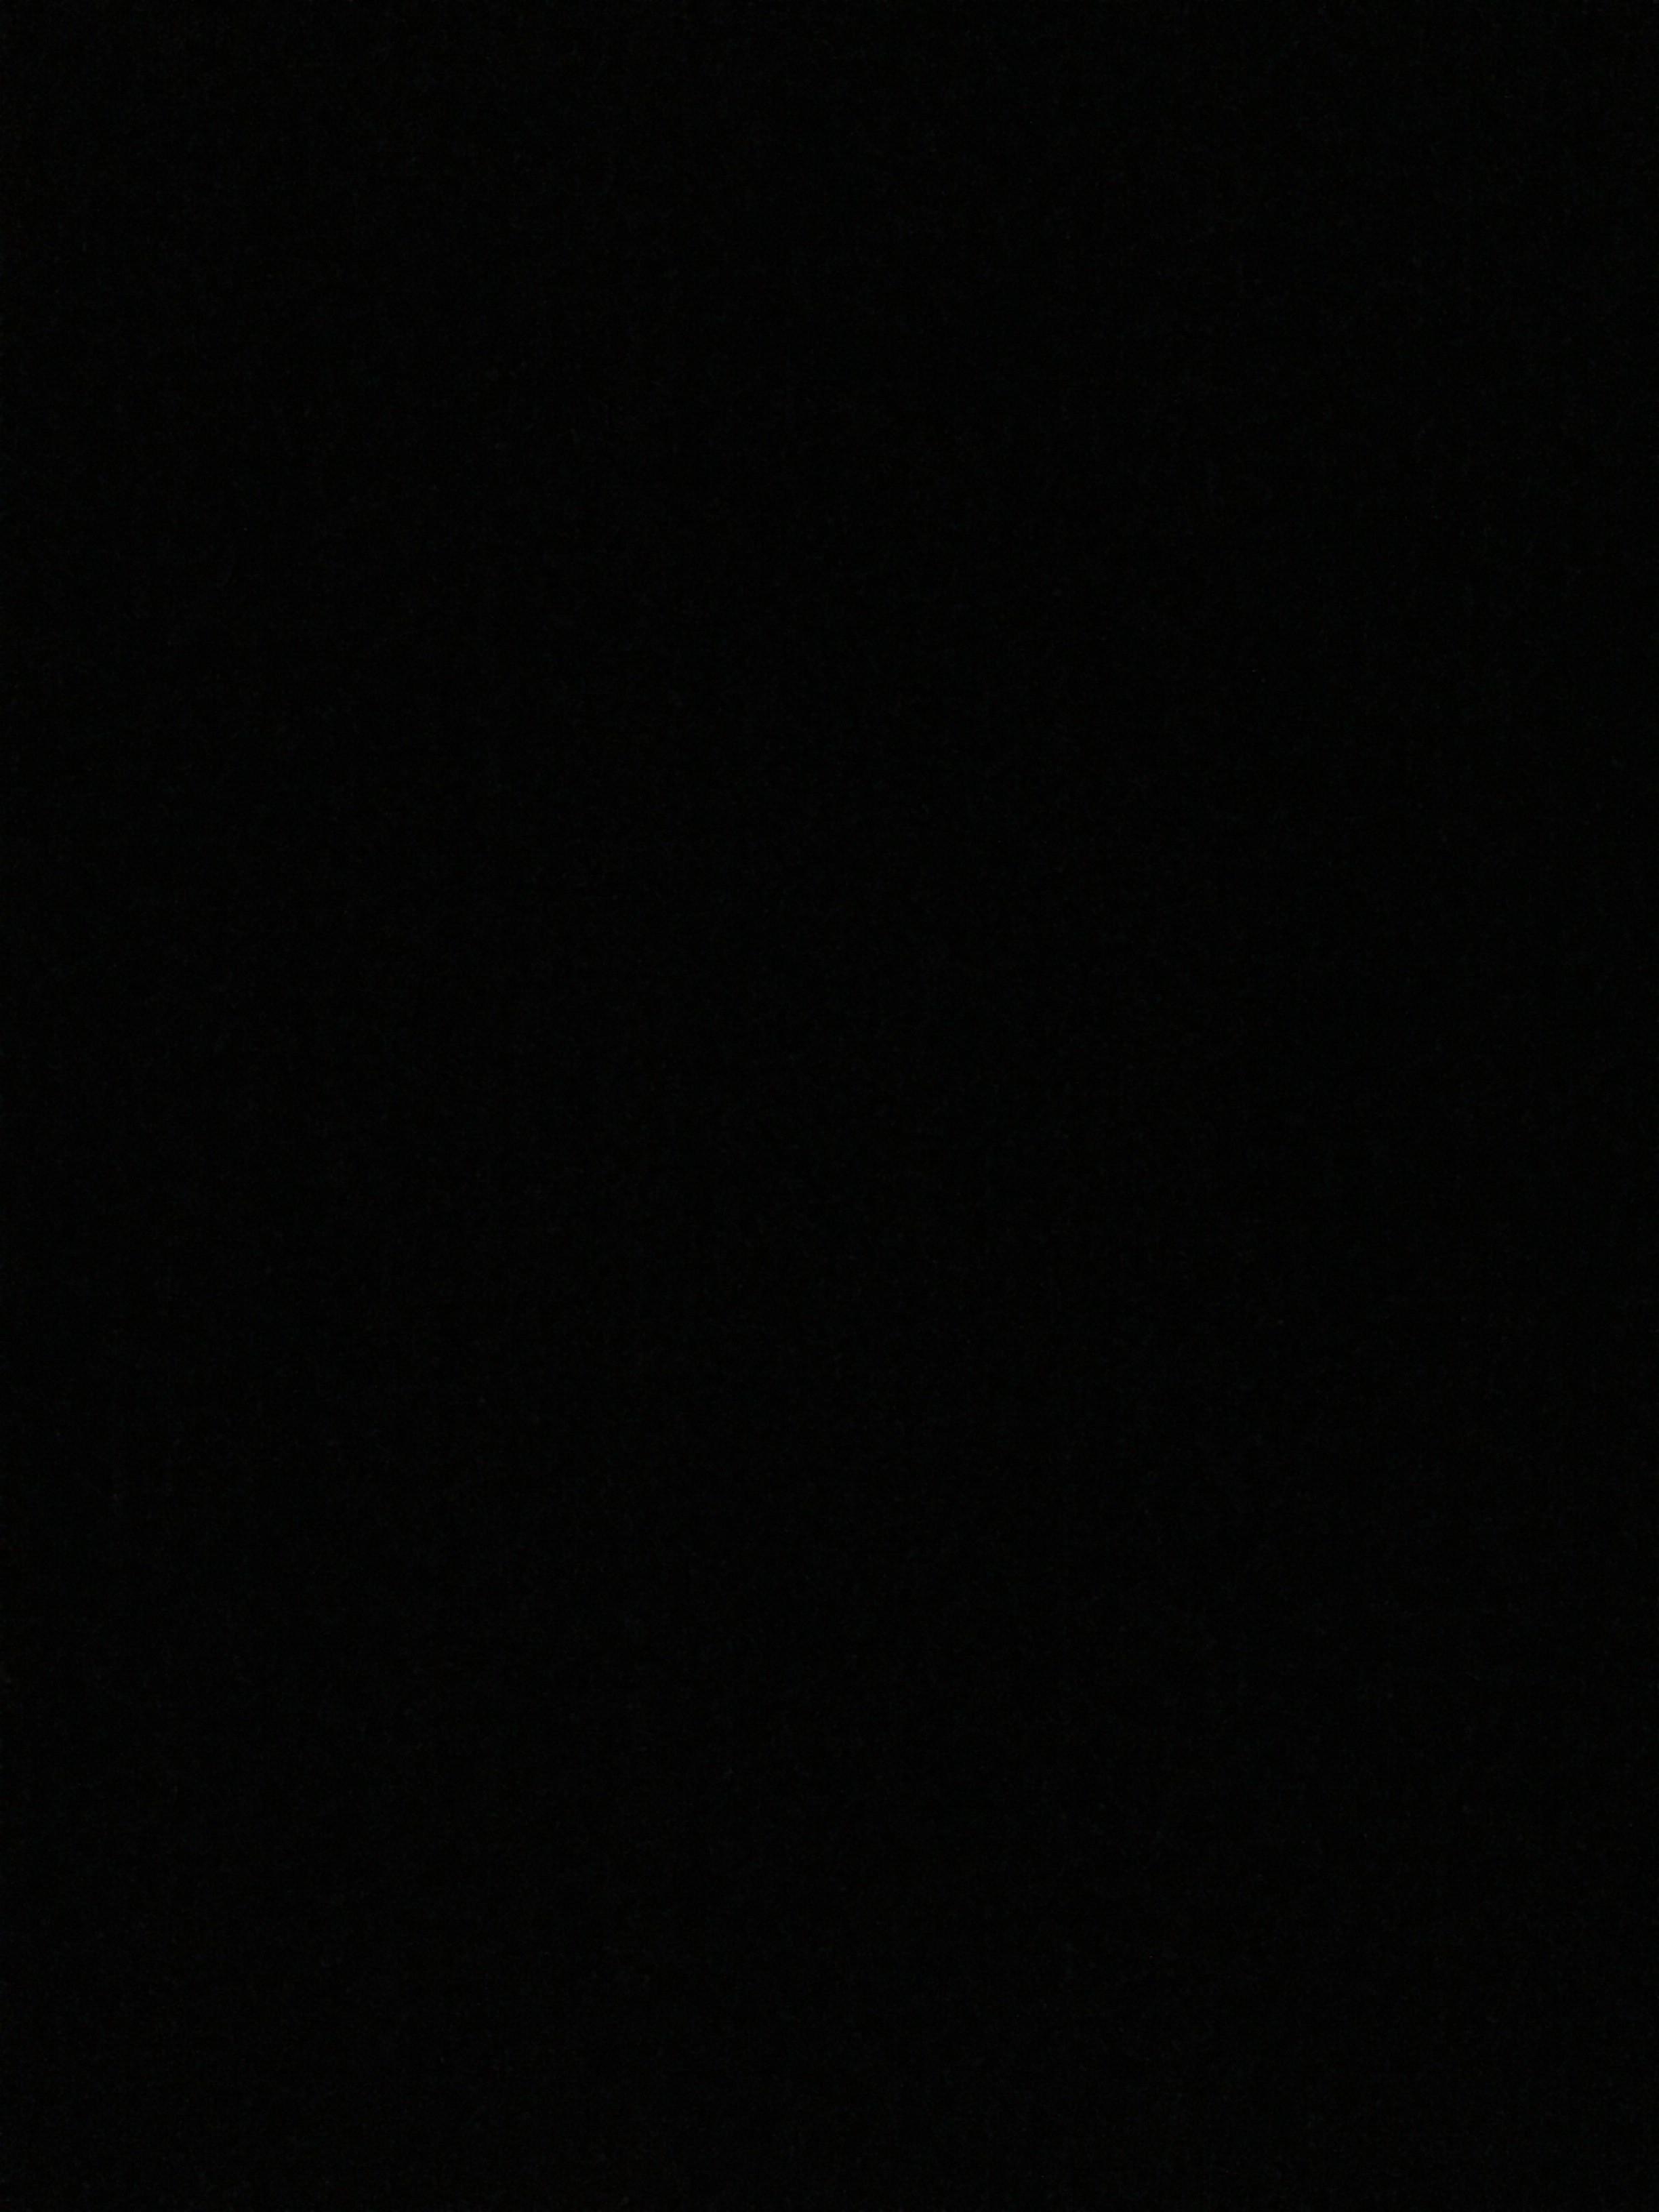 Фламп аура цветов красноярск ленина